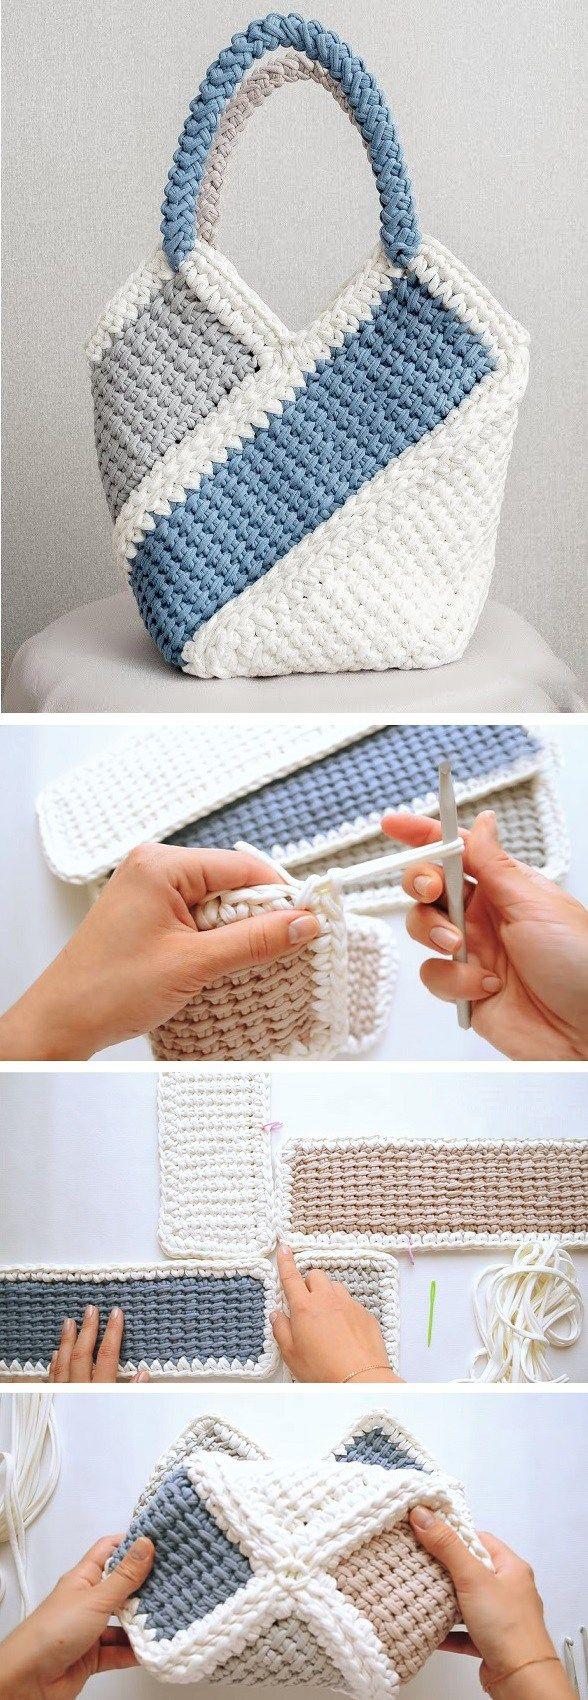 Pretty Lady Bag Crochet Tutorial | crochet | Pinterest | Ladies bags ...